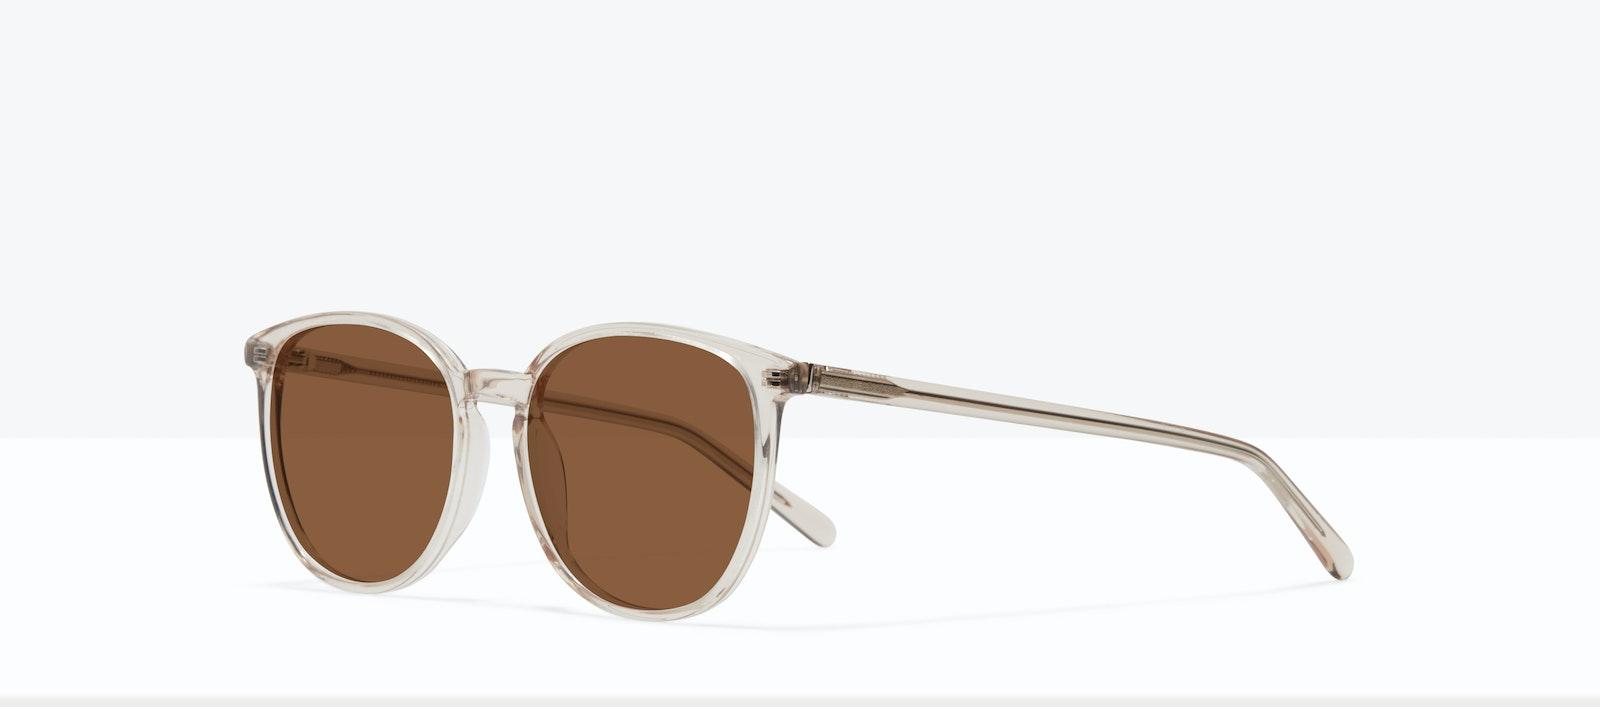 Affordable Fashion Glasses Round Sunglasses Women Femme Libre S Margo Tilt